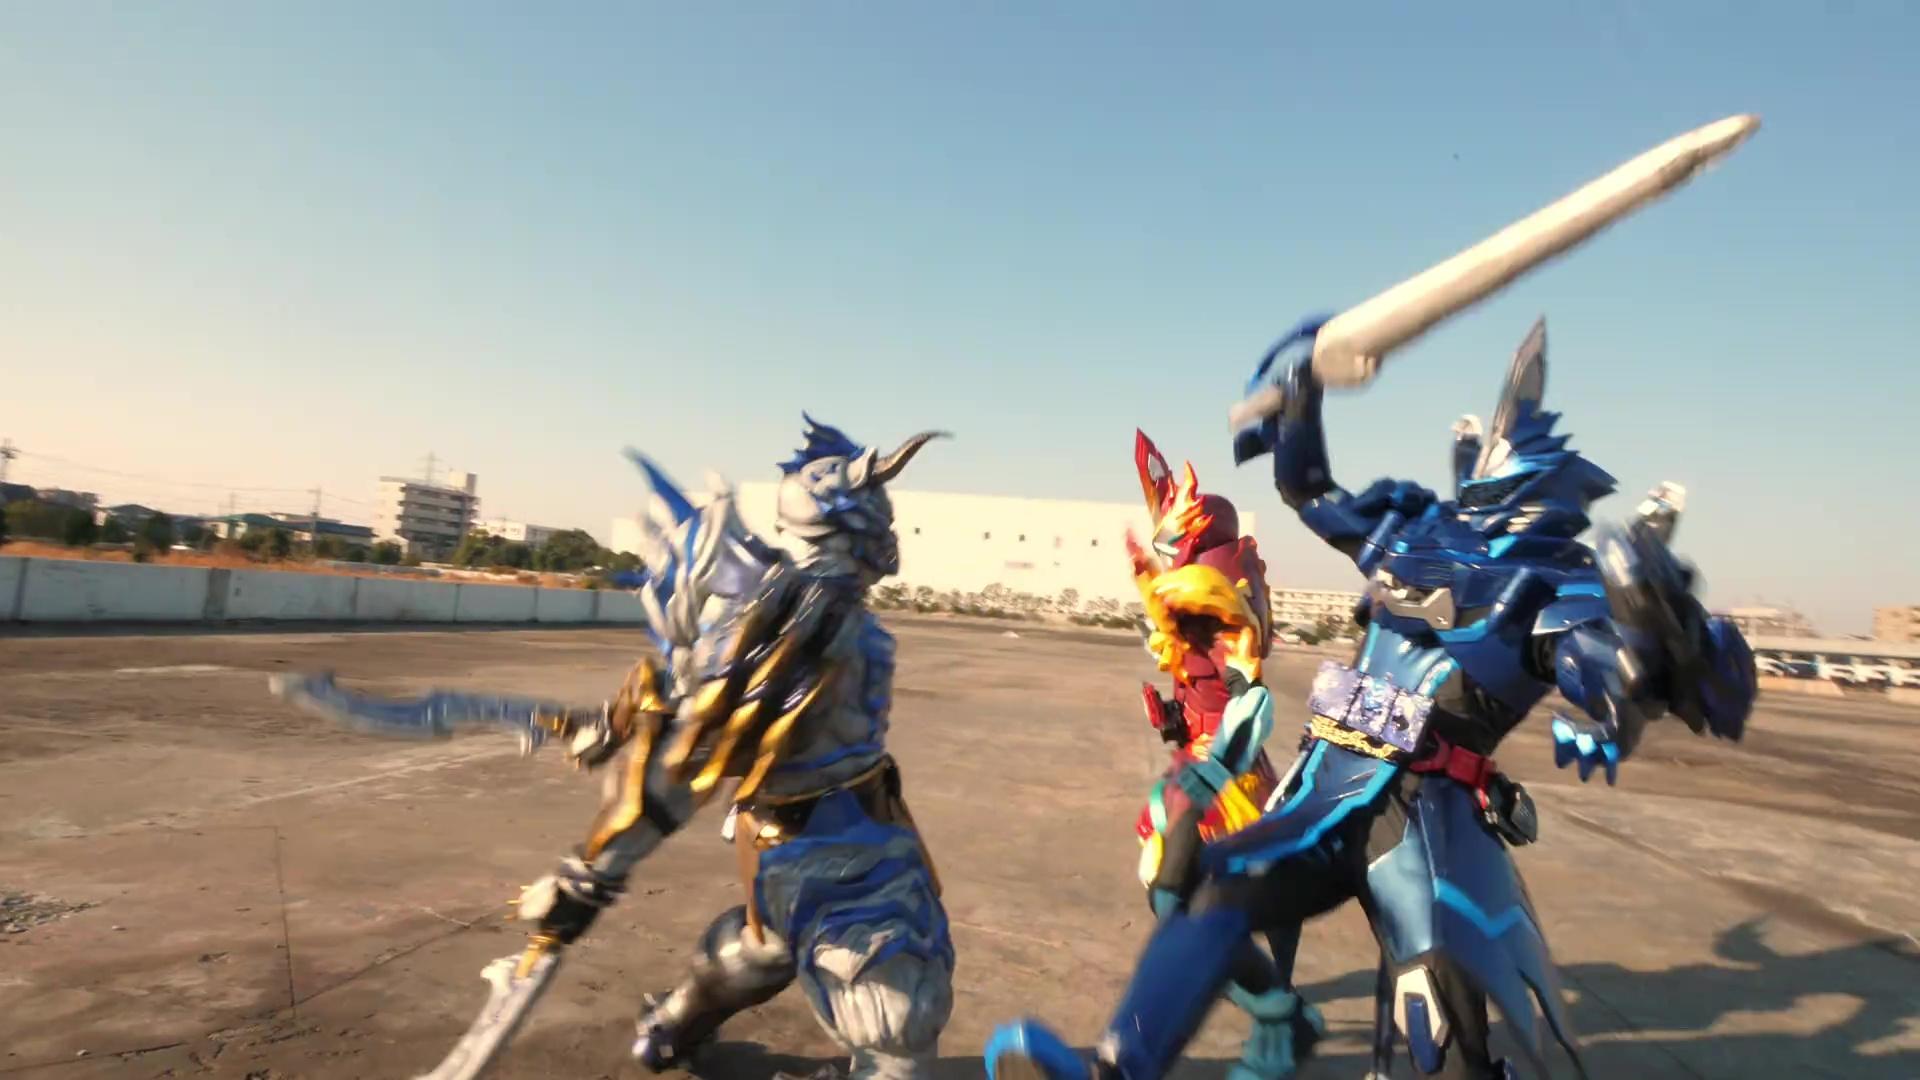 Kamen Rider Saber Episode 31 Recap